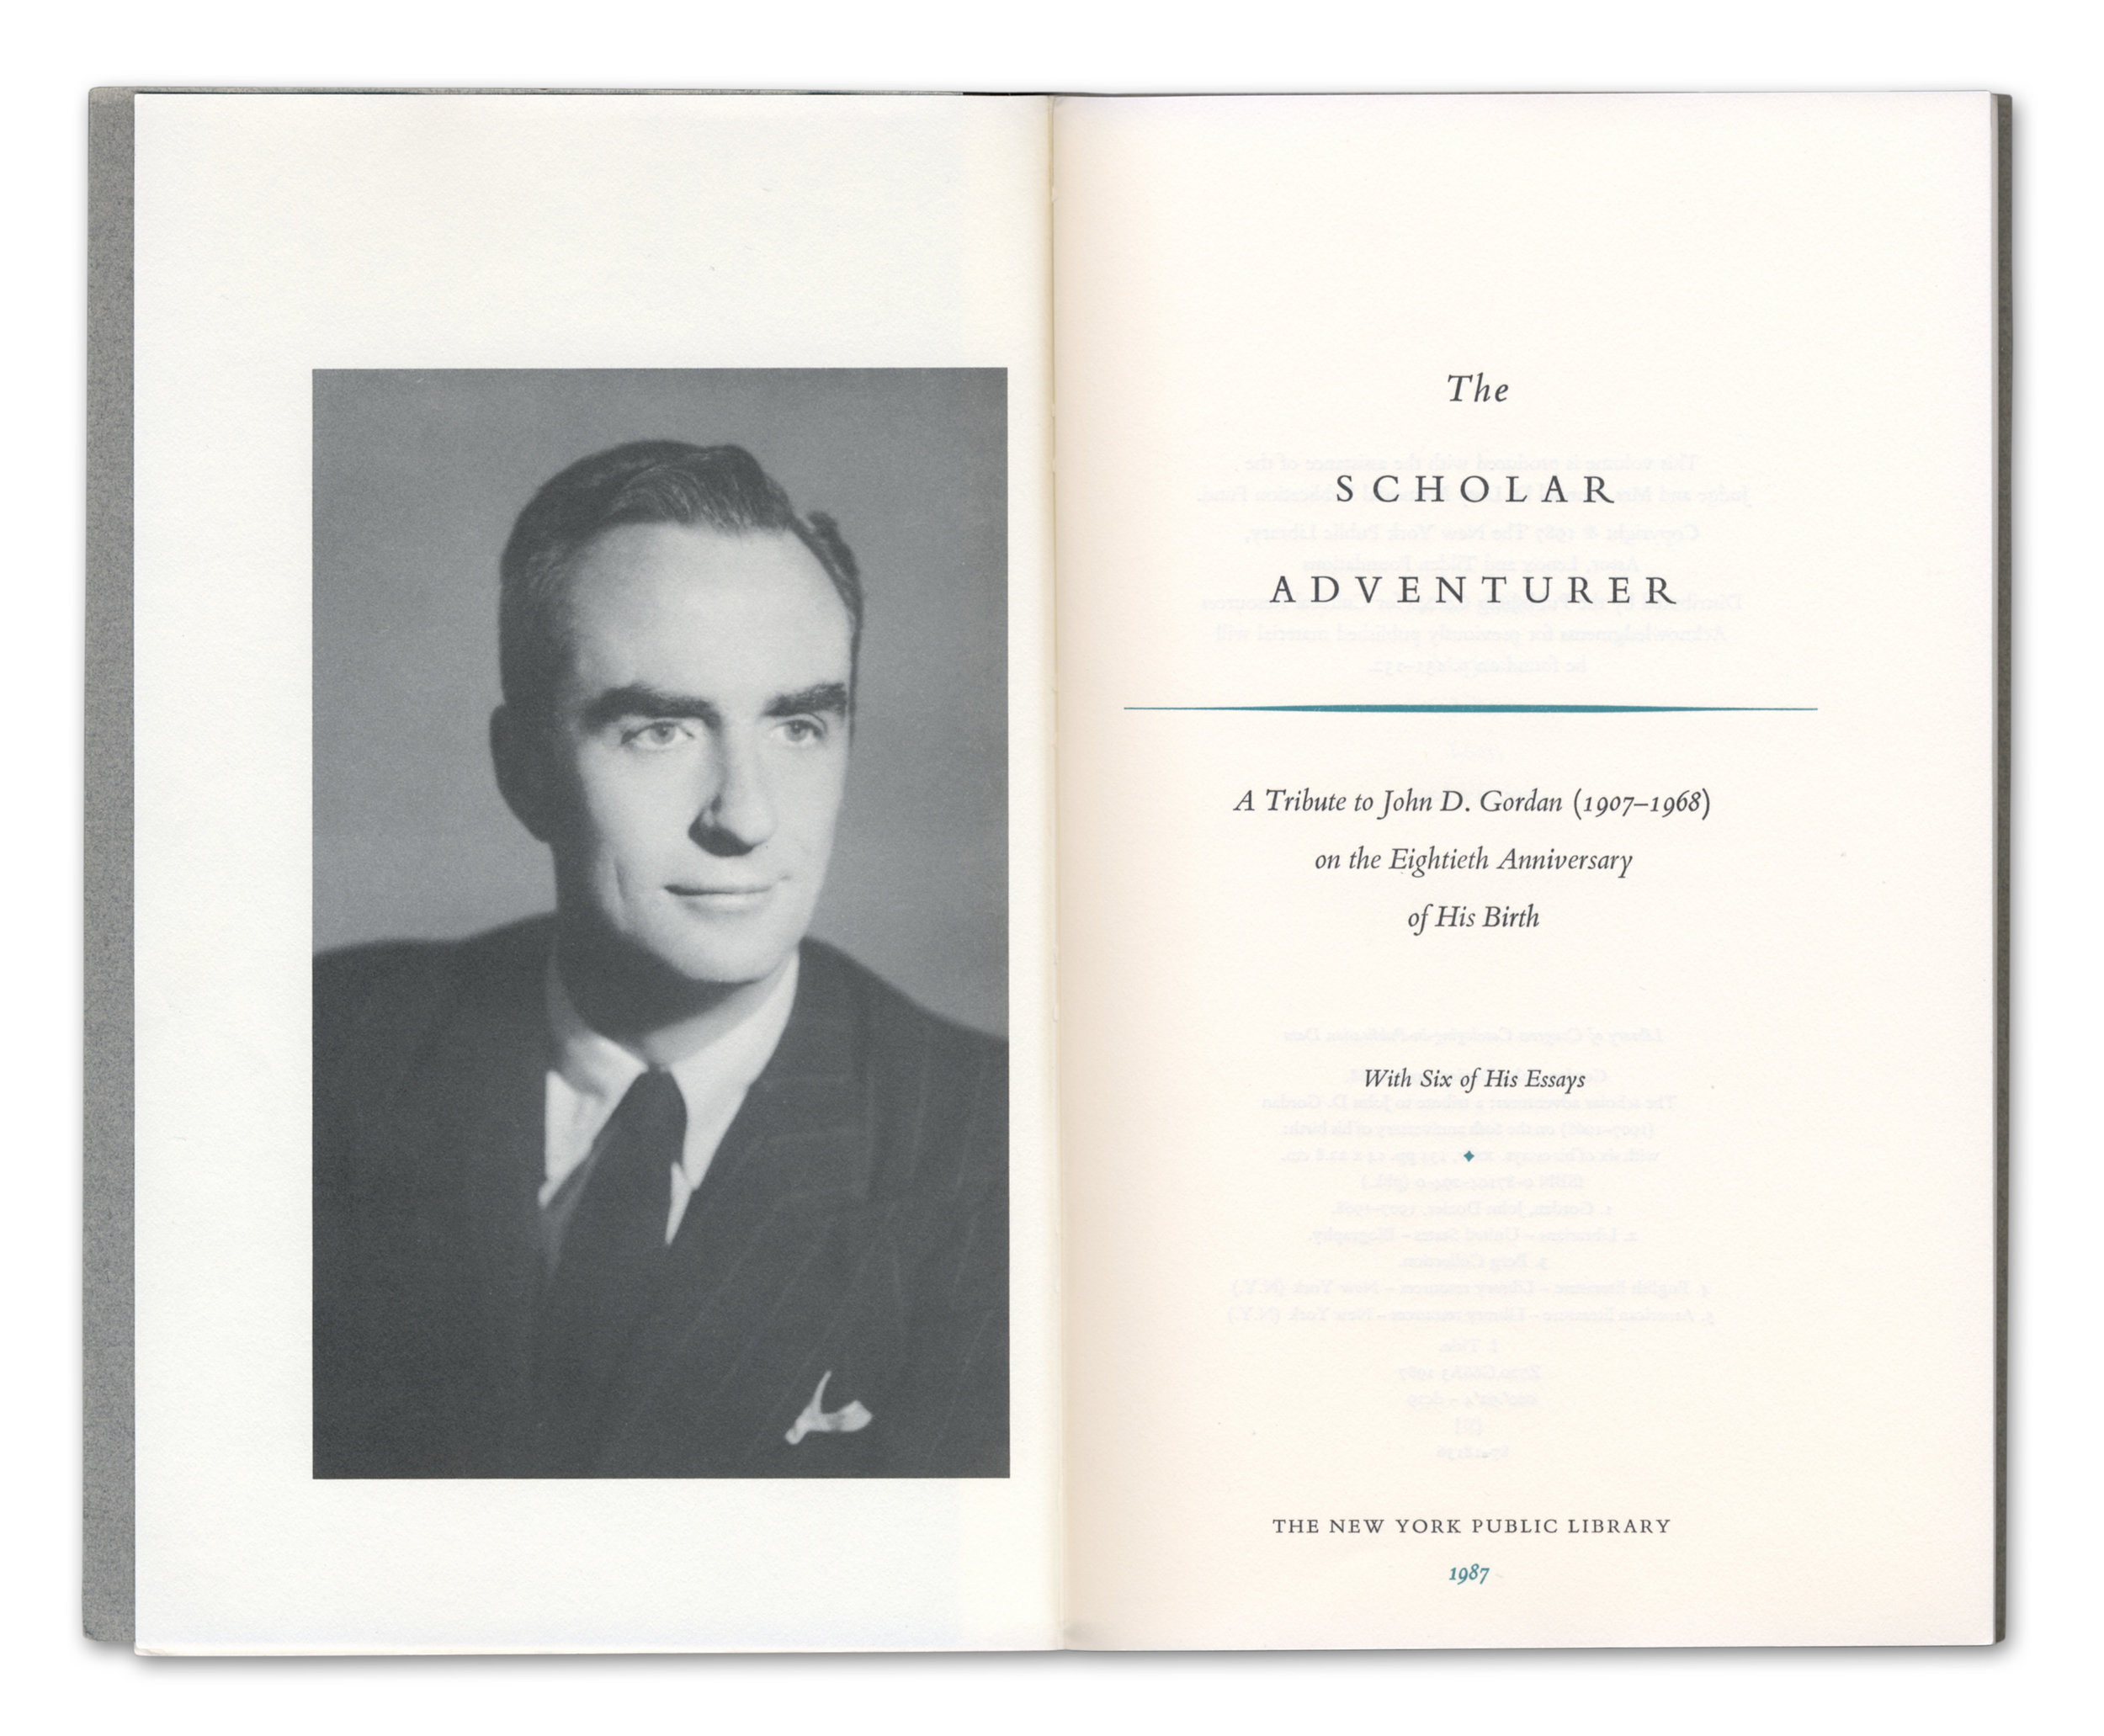 The Scholar Adventurer